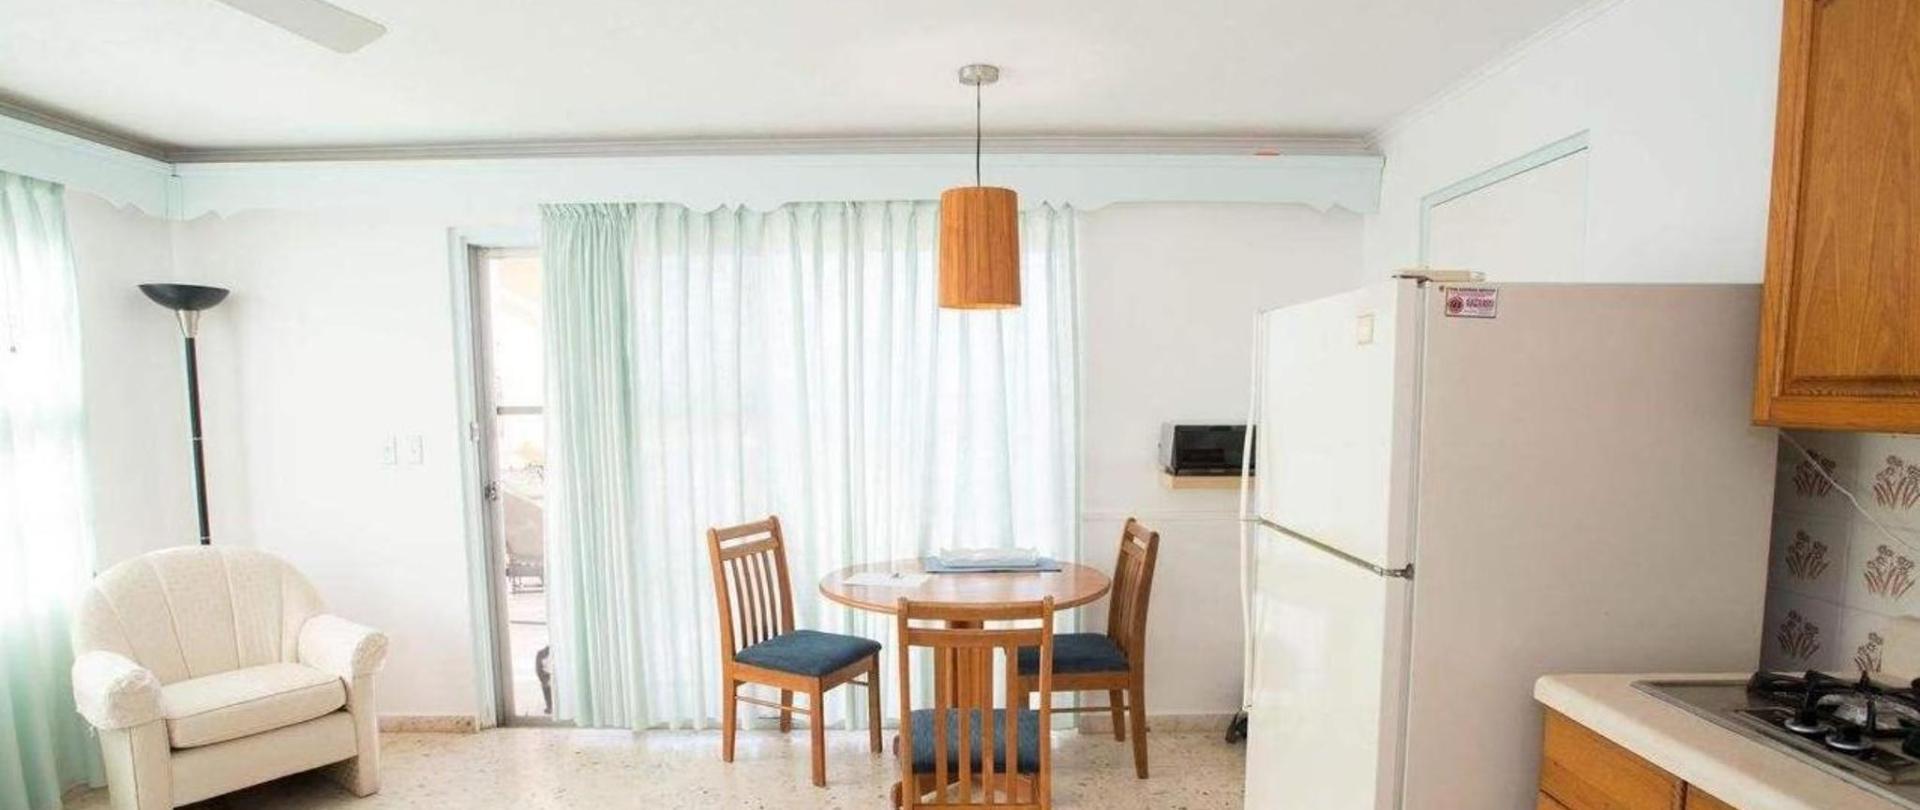 Kitchen Vistalmar Aruba Accommodation.jpg